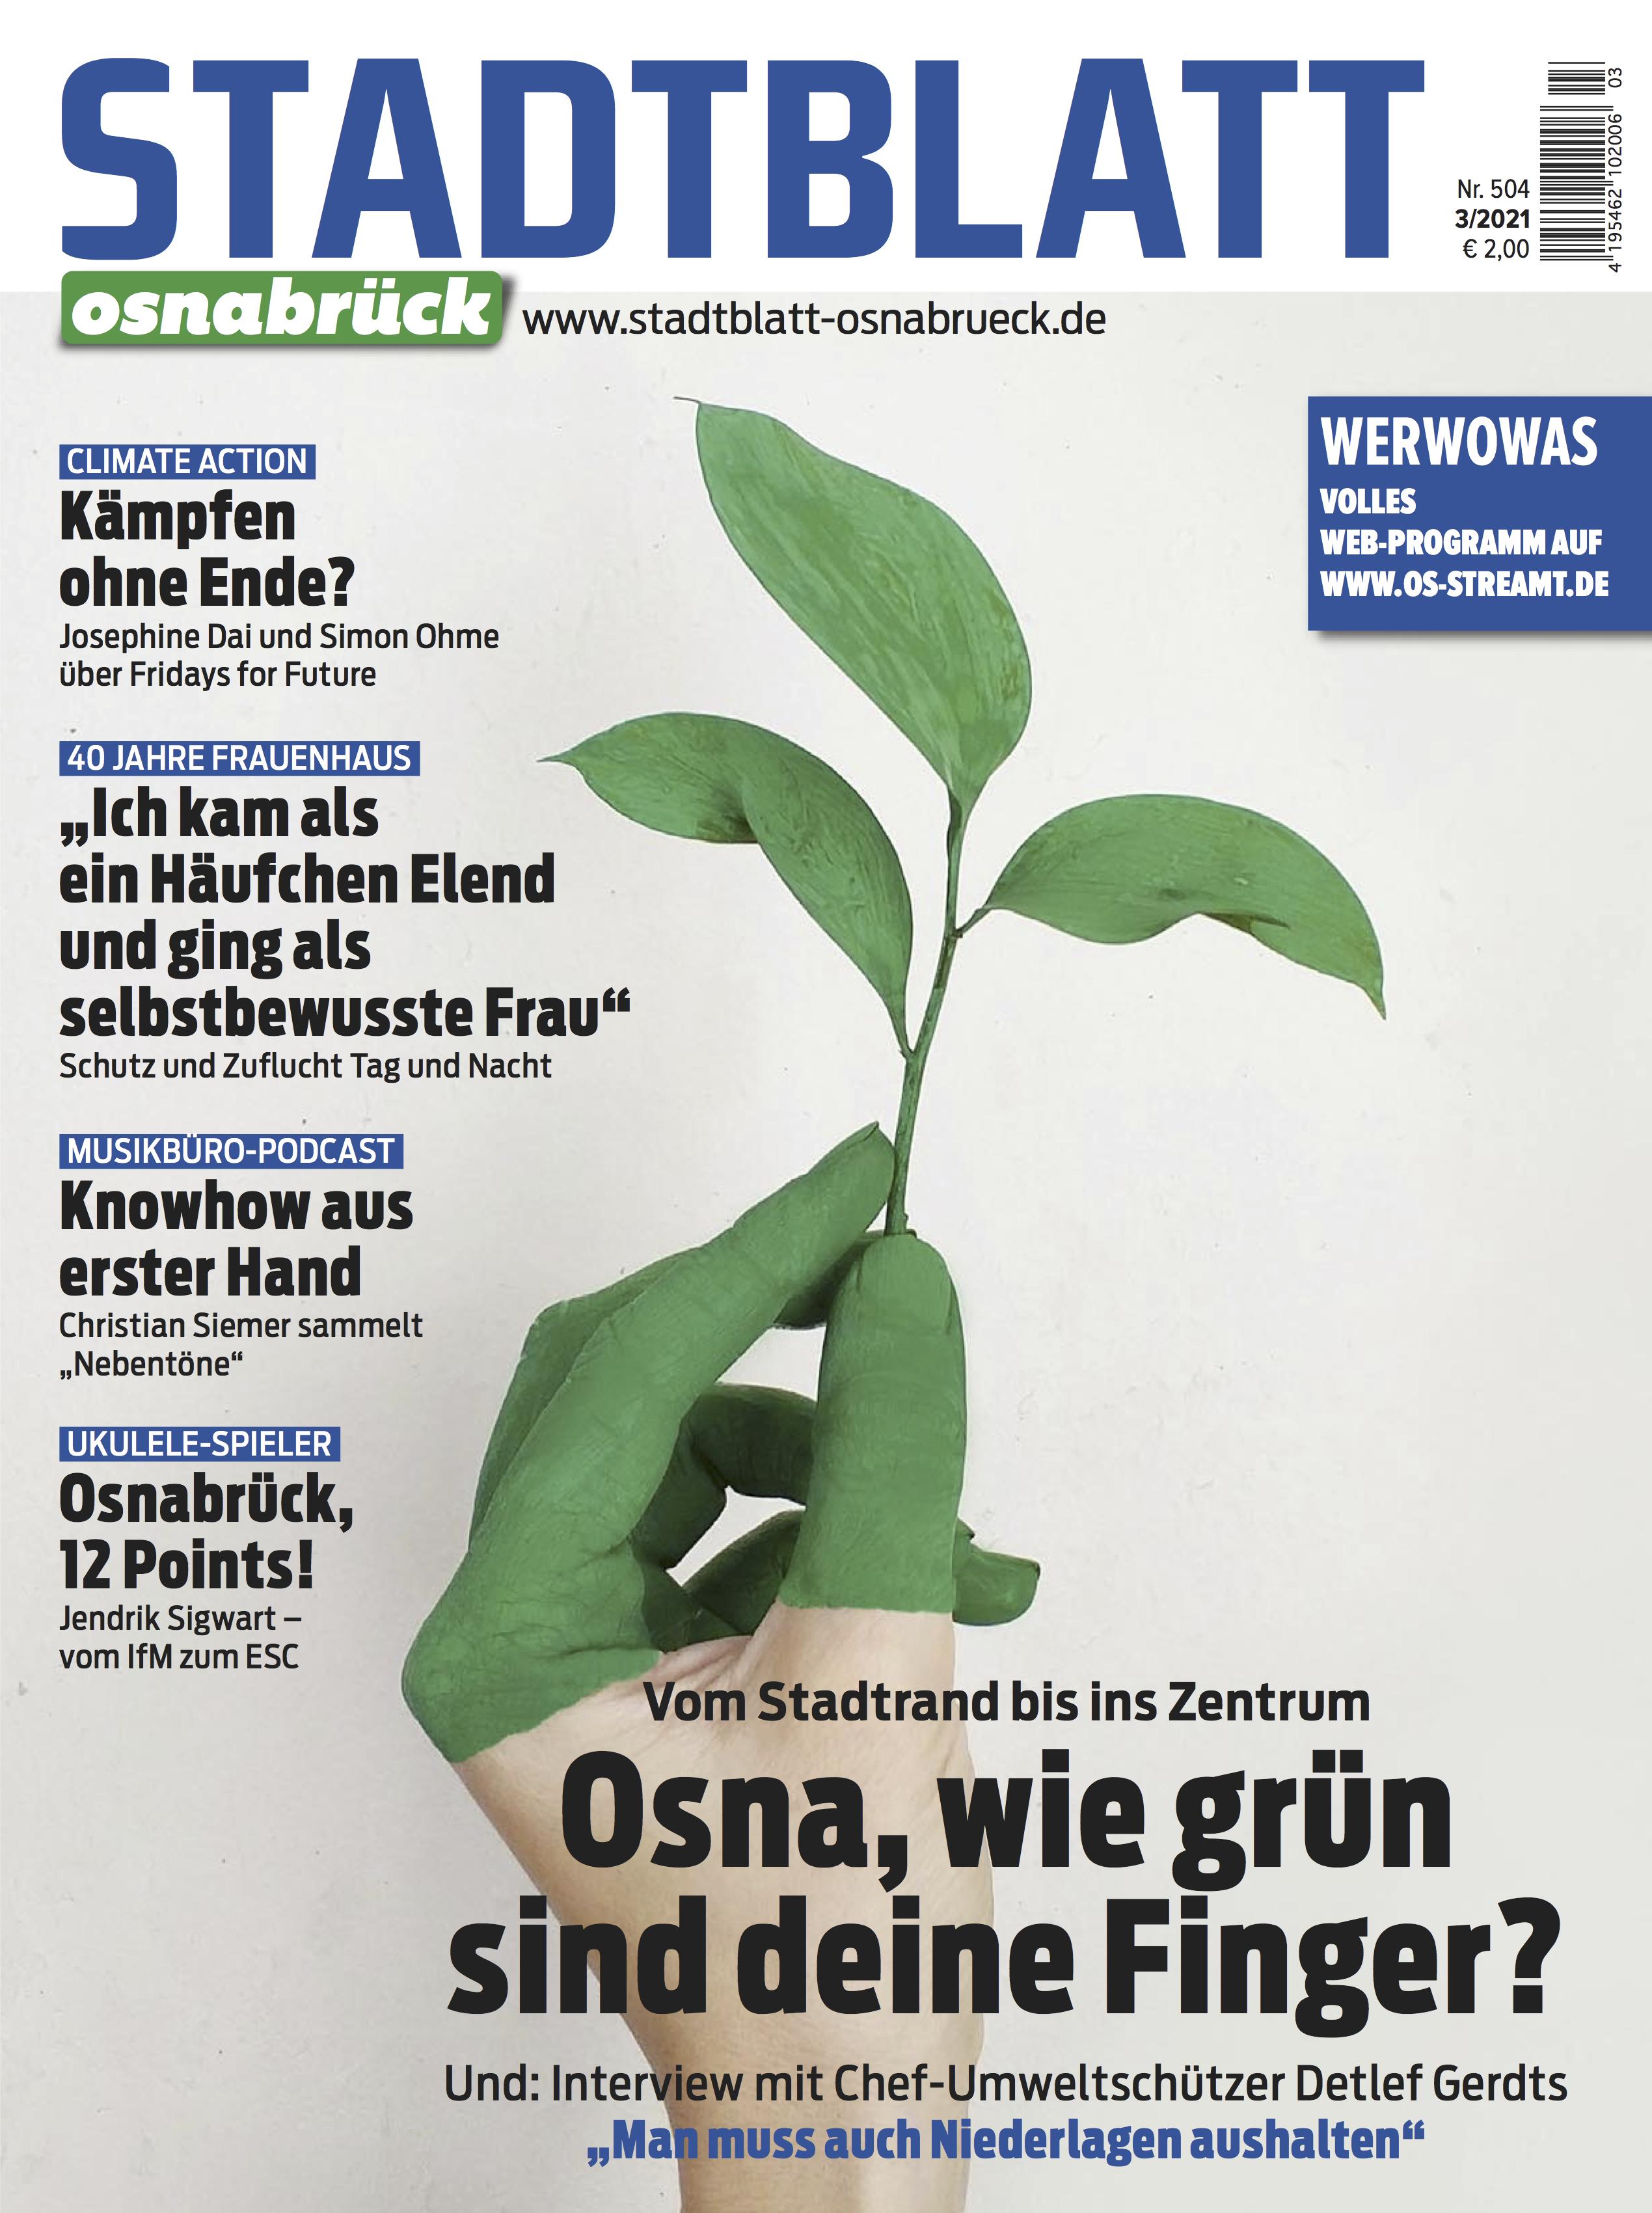 Stadtblatt_2021_03 1